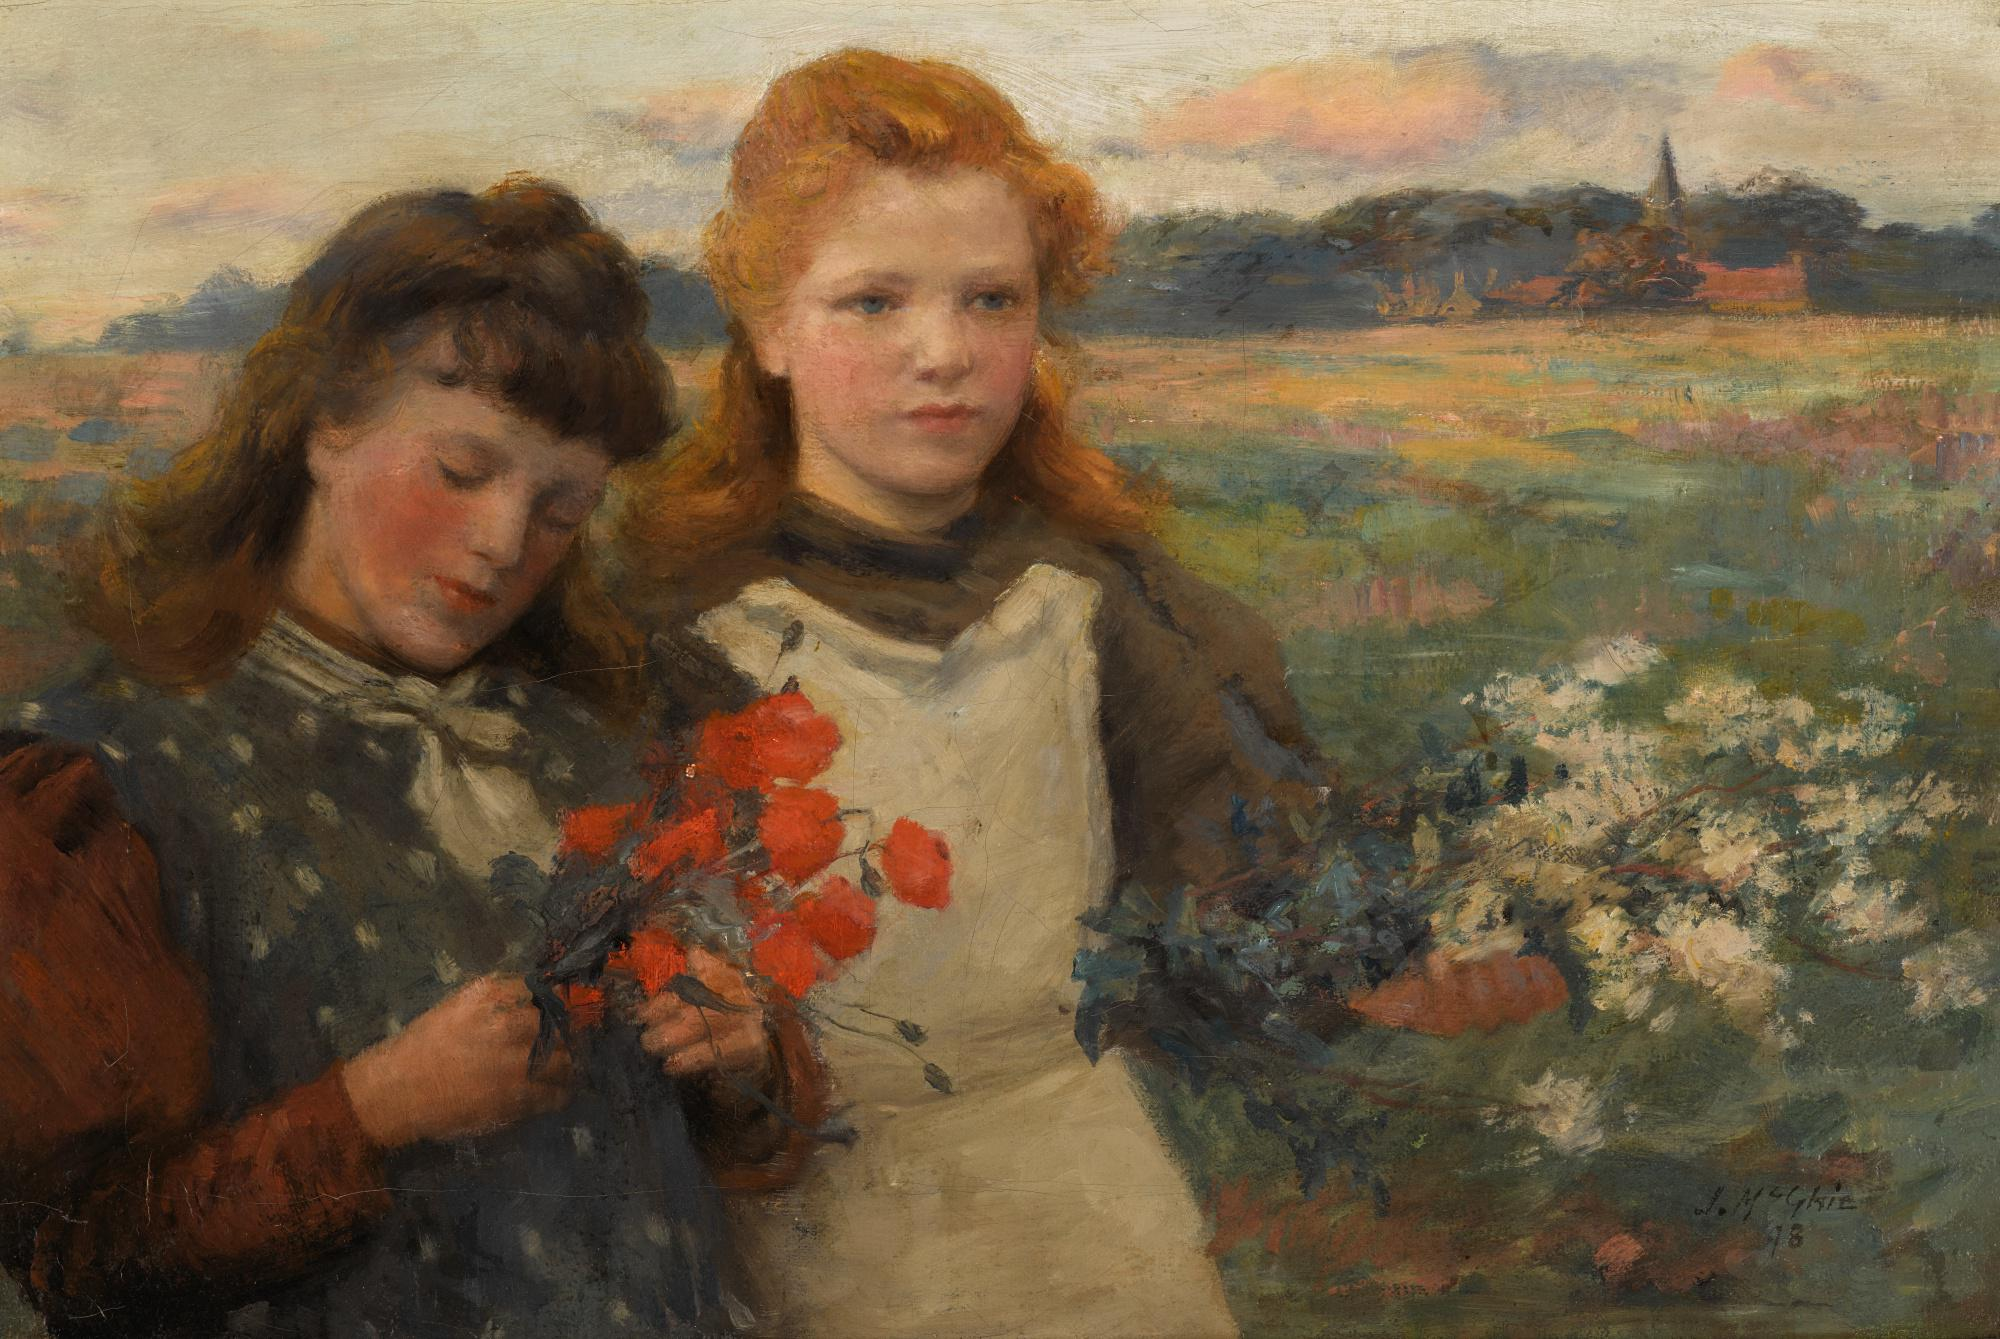 JOHN MCGHIE, R.S.A., R.S.W. | PICKING WILD FLOWERS